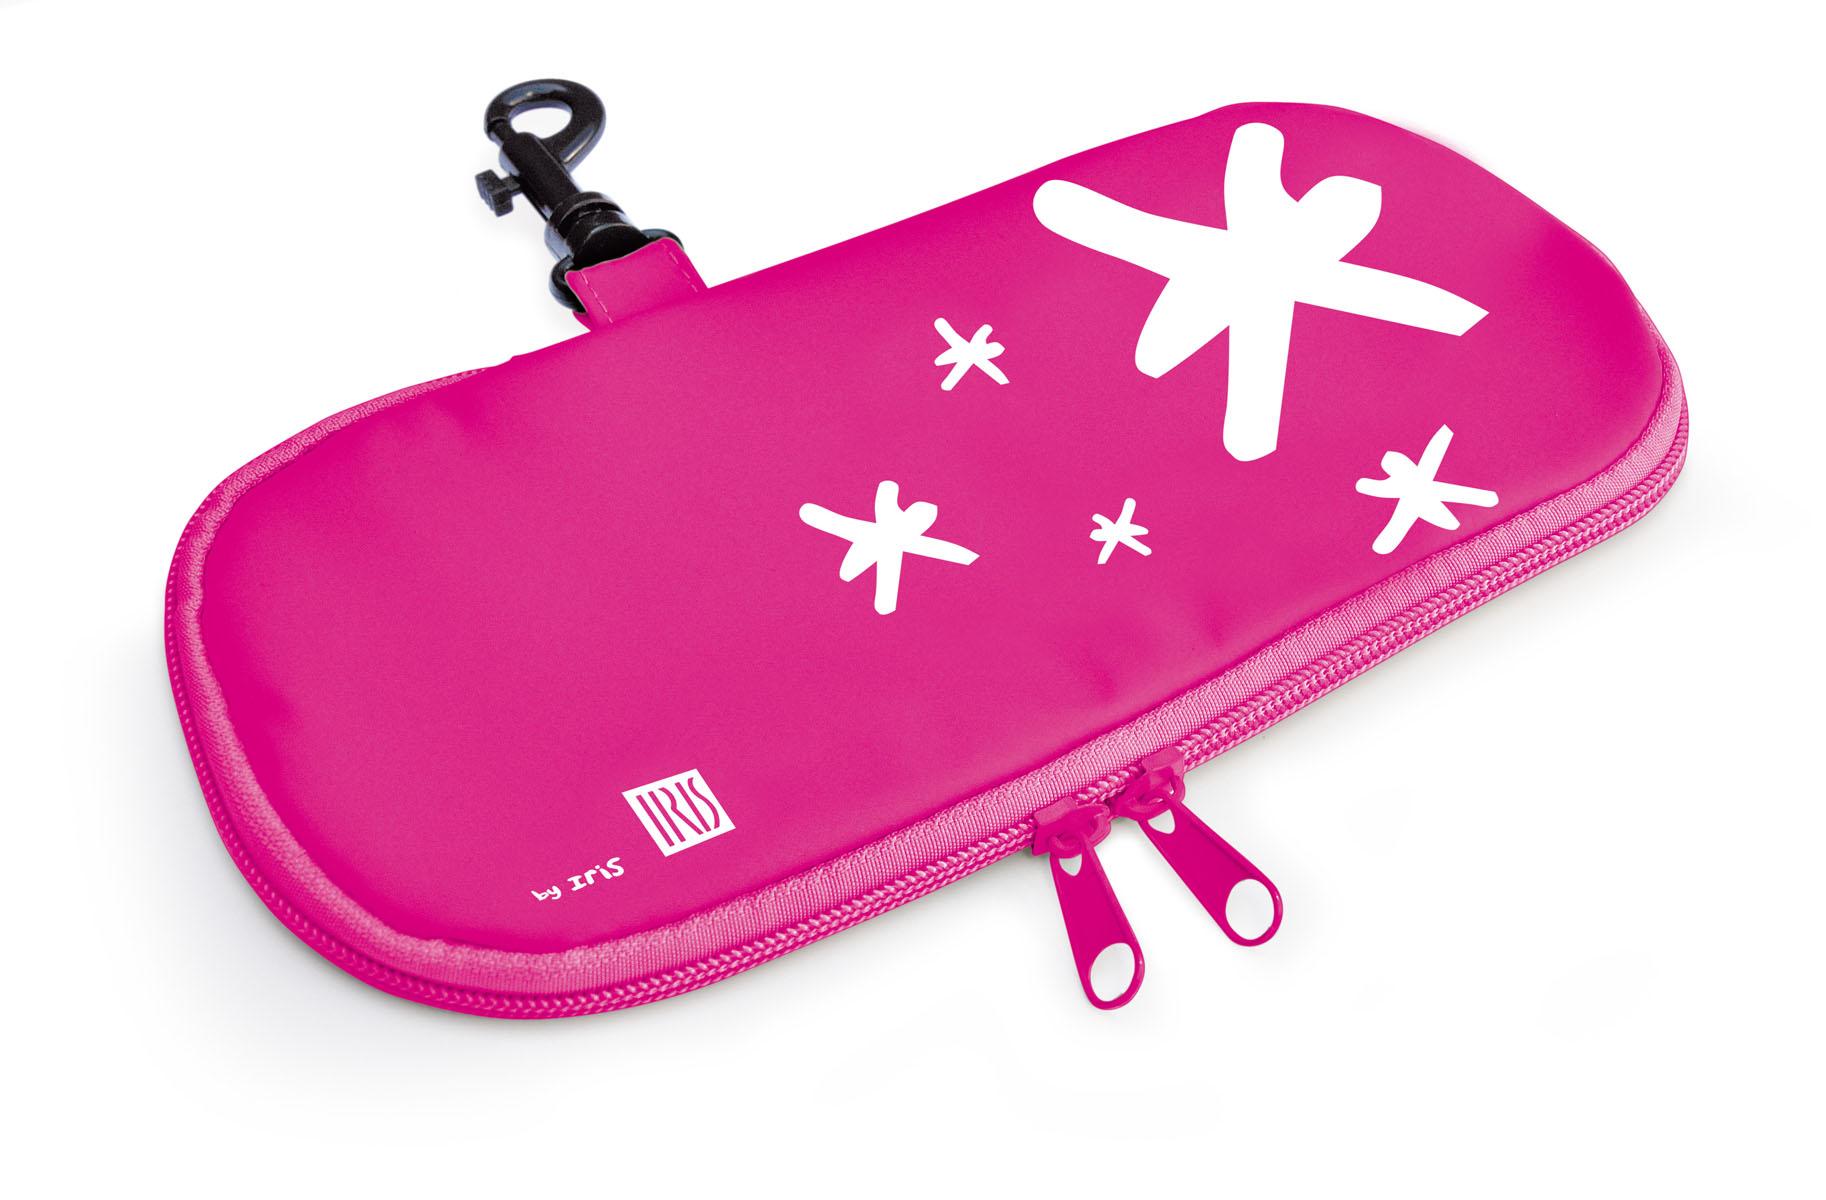 "Термобутербродница мягкая Iris Barcelona ""Kids"", цвет: розовый, 24 х 12 см"